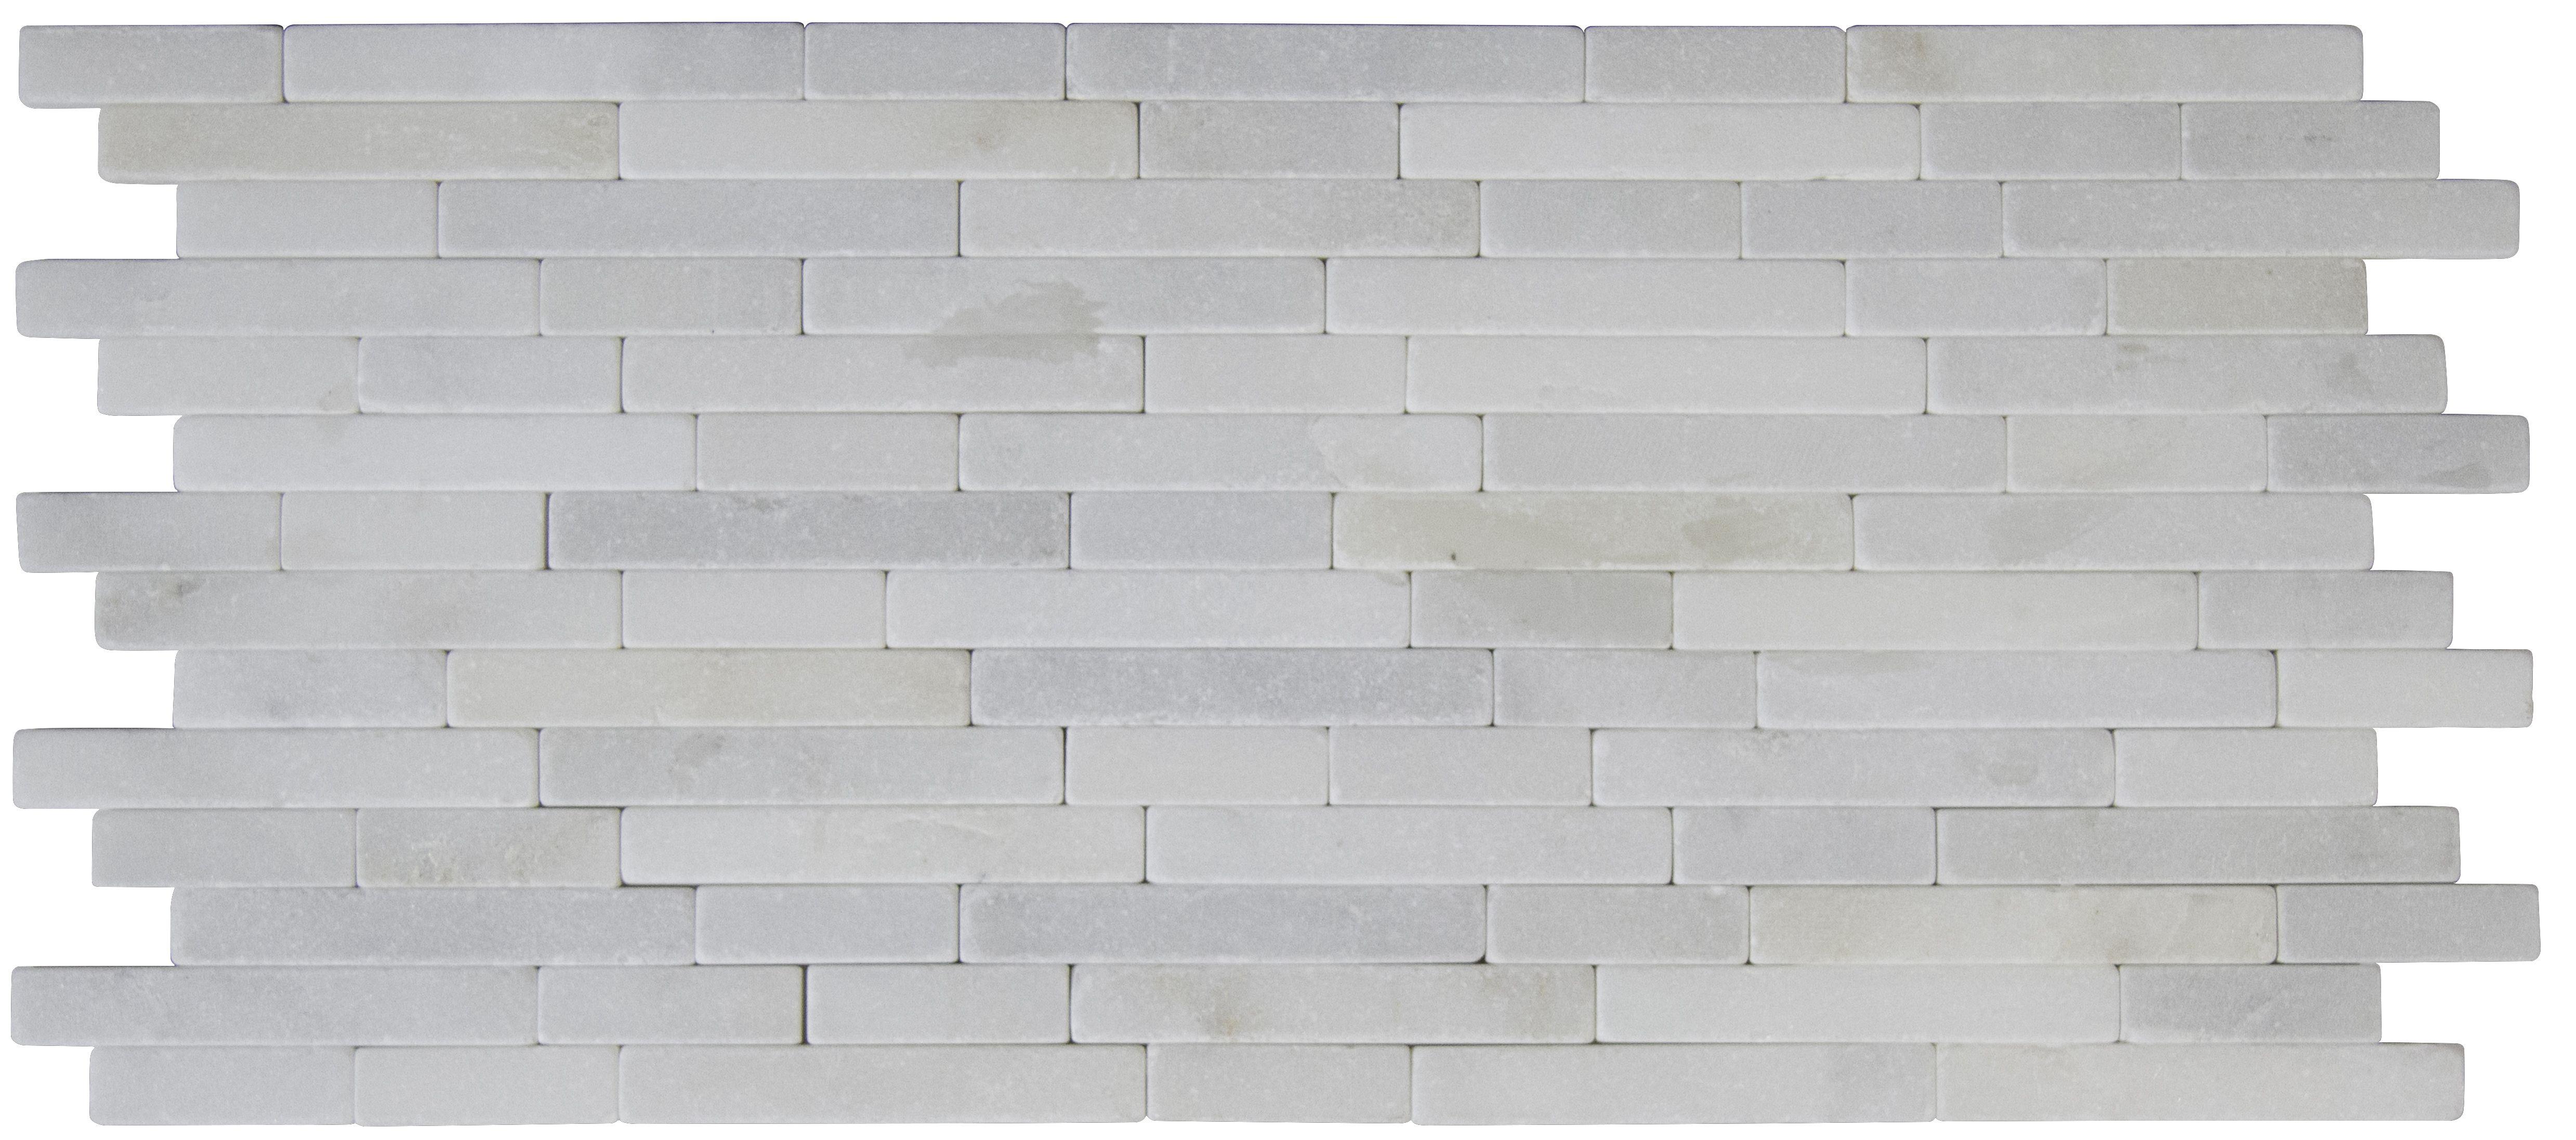 "Arabescato Carrara - Arabescato Carrara / 8""x18"" / Tumbled"